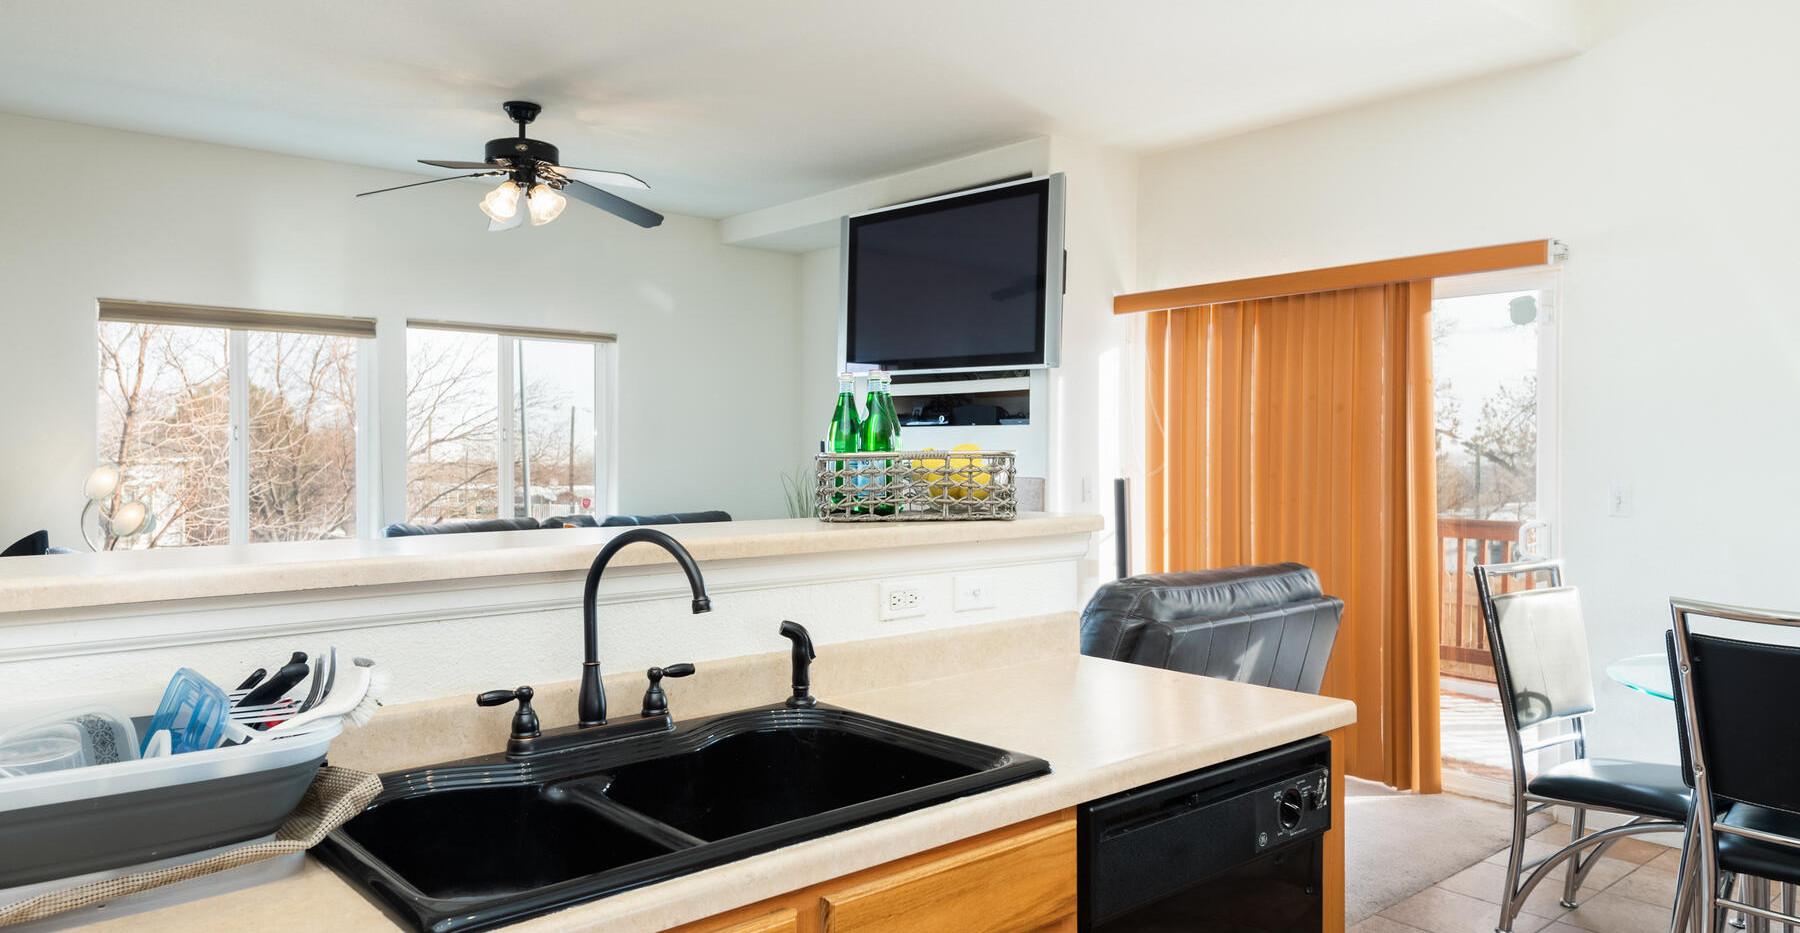 2112 W 101st Circle-016-028-Kitchen-MLS_